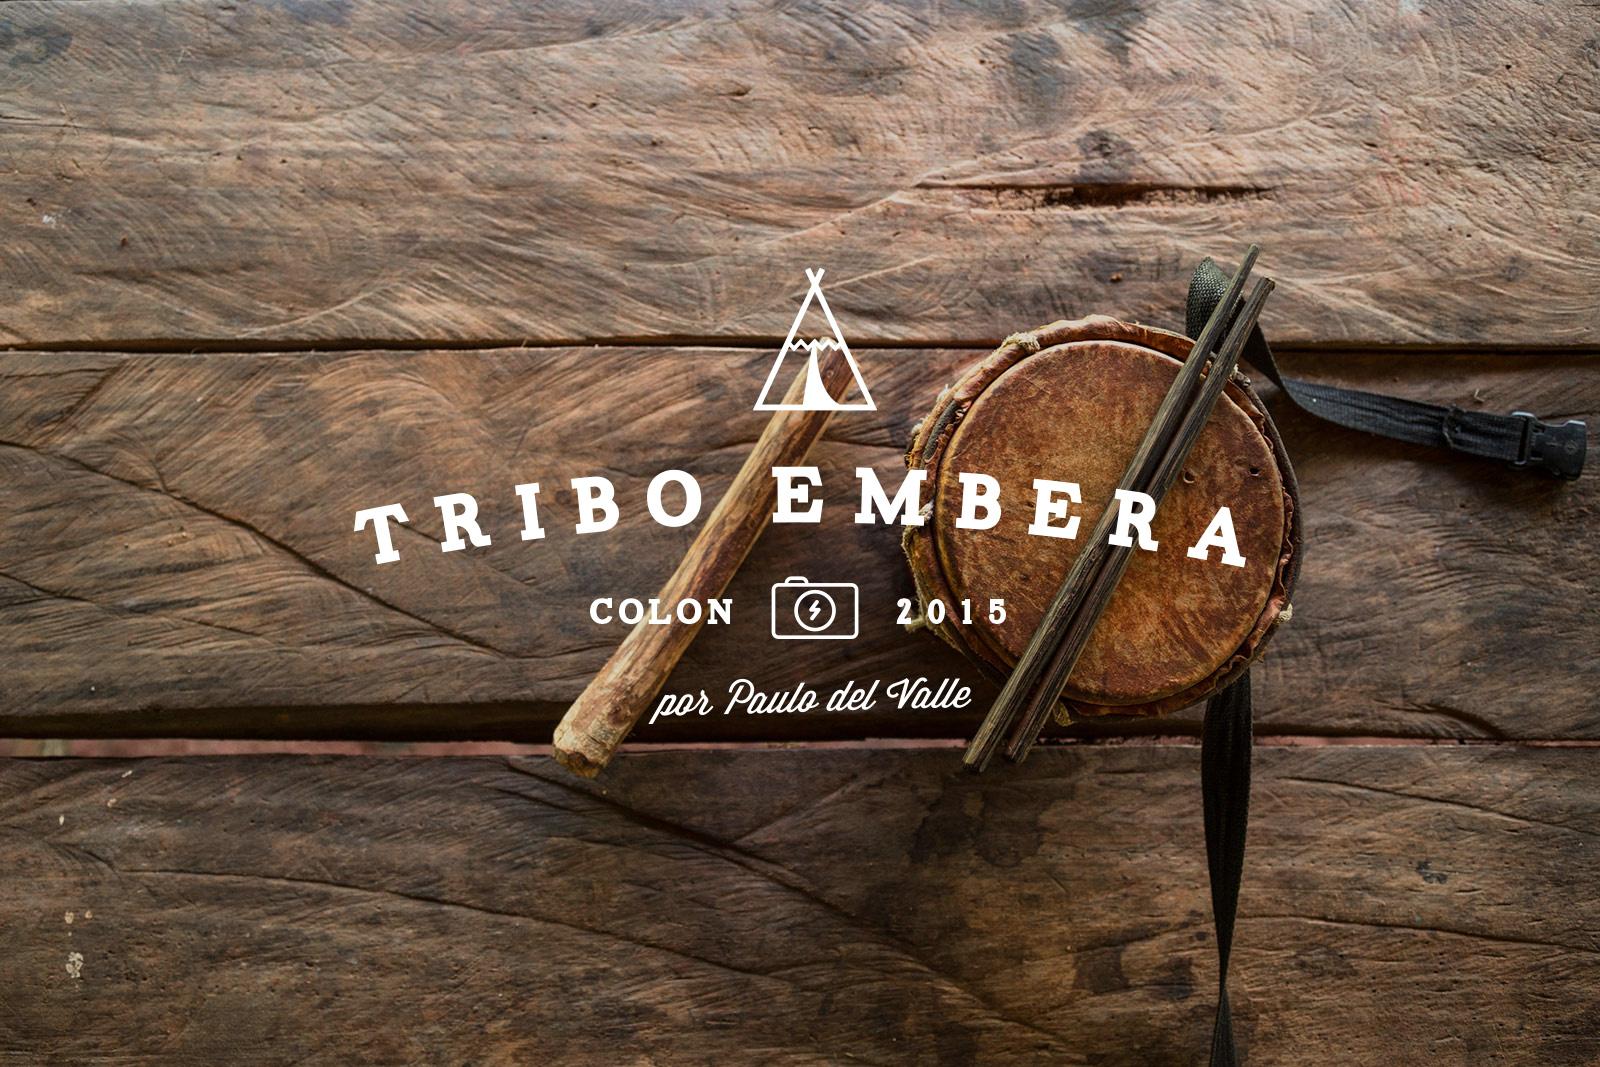 A experiência de visitar uma tribo indígena